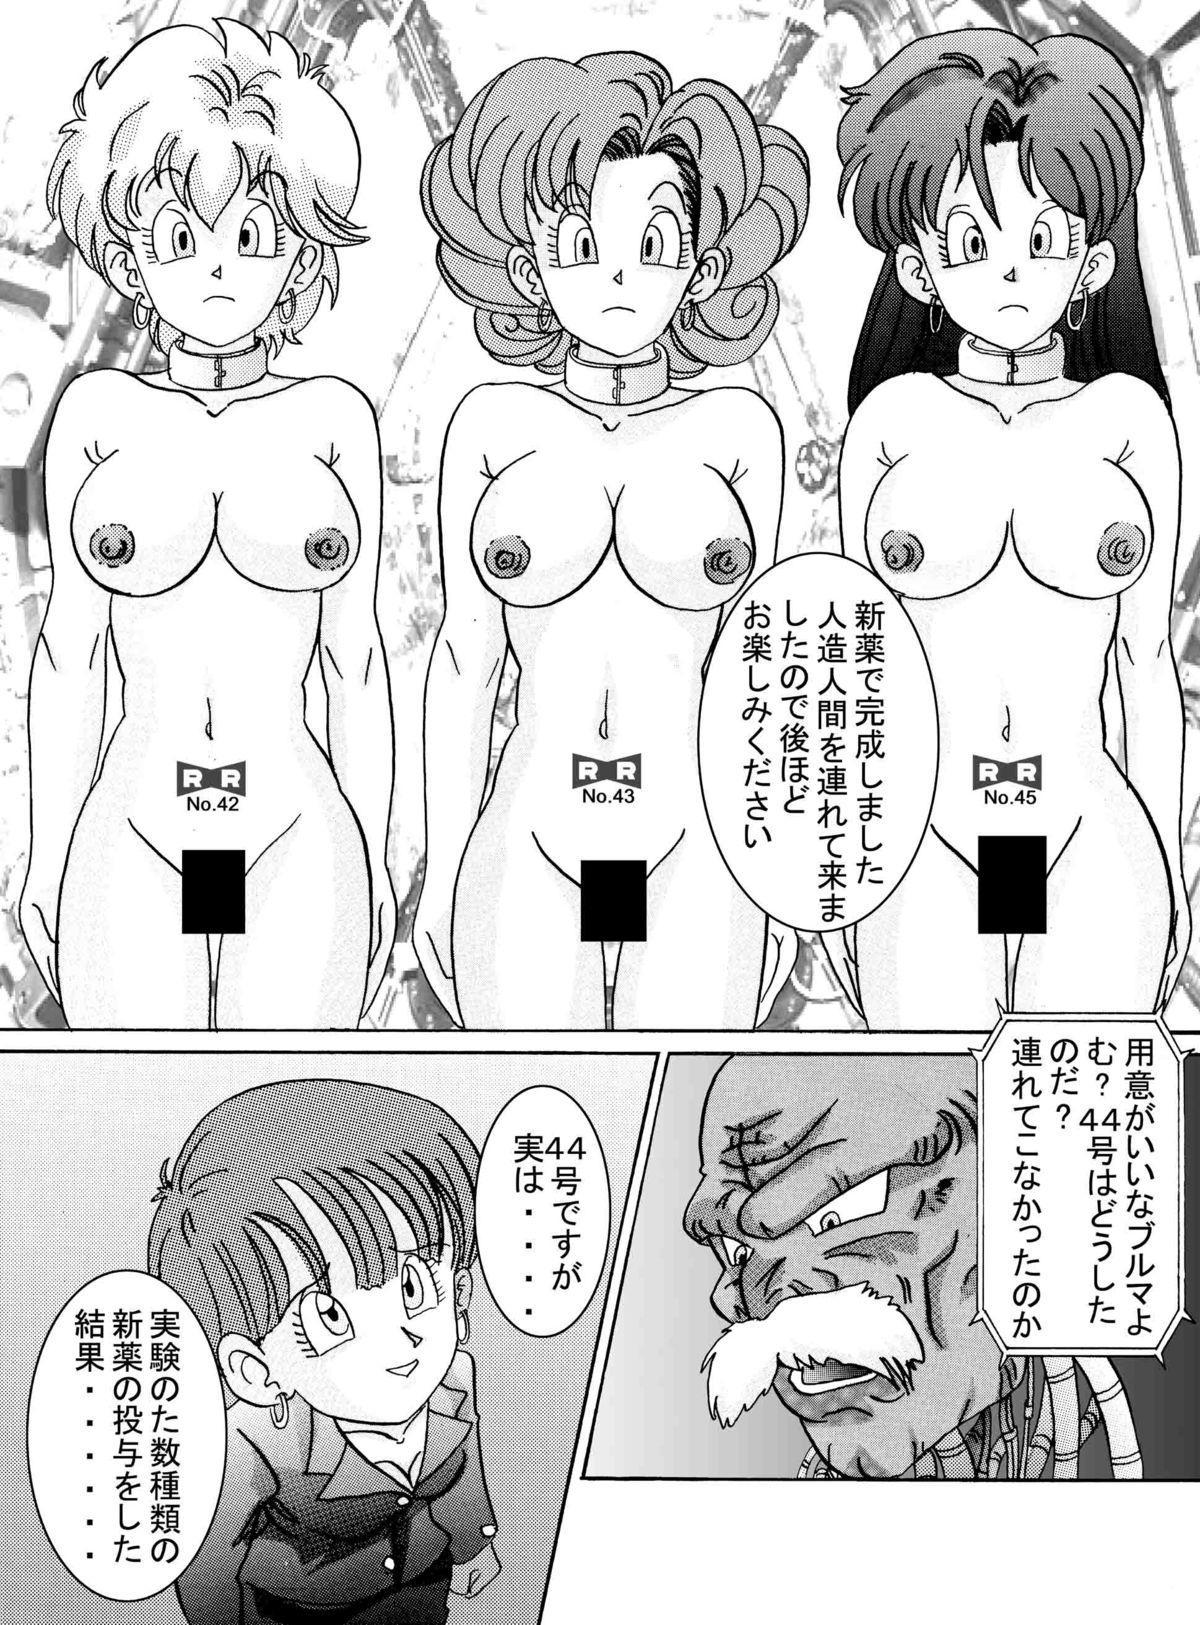 [Light Rate Port Pink] Tanjou!! Aku no Onna Senshi Jinzou Ningen 18-gou Sennou Kaizou Keikaku -Joshou- (Dragon Ball Z) 8